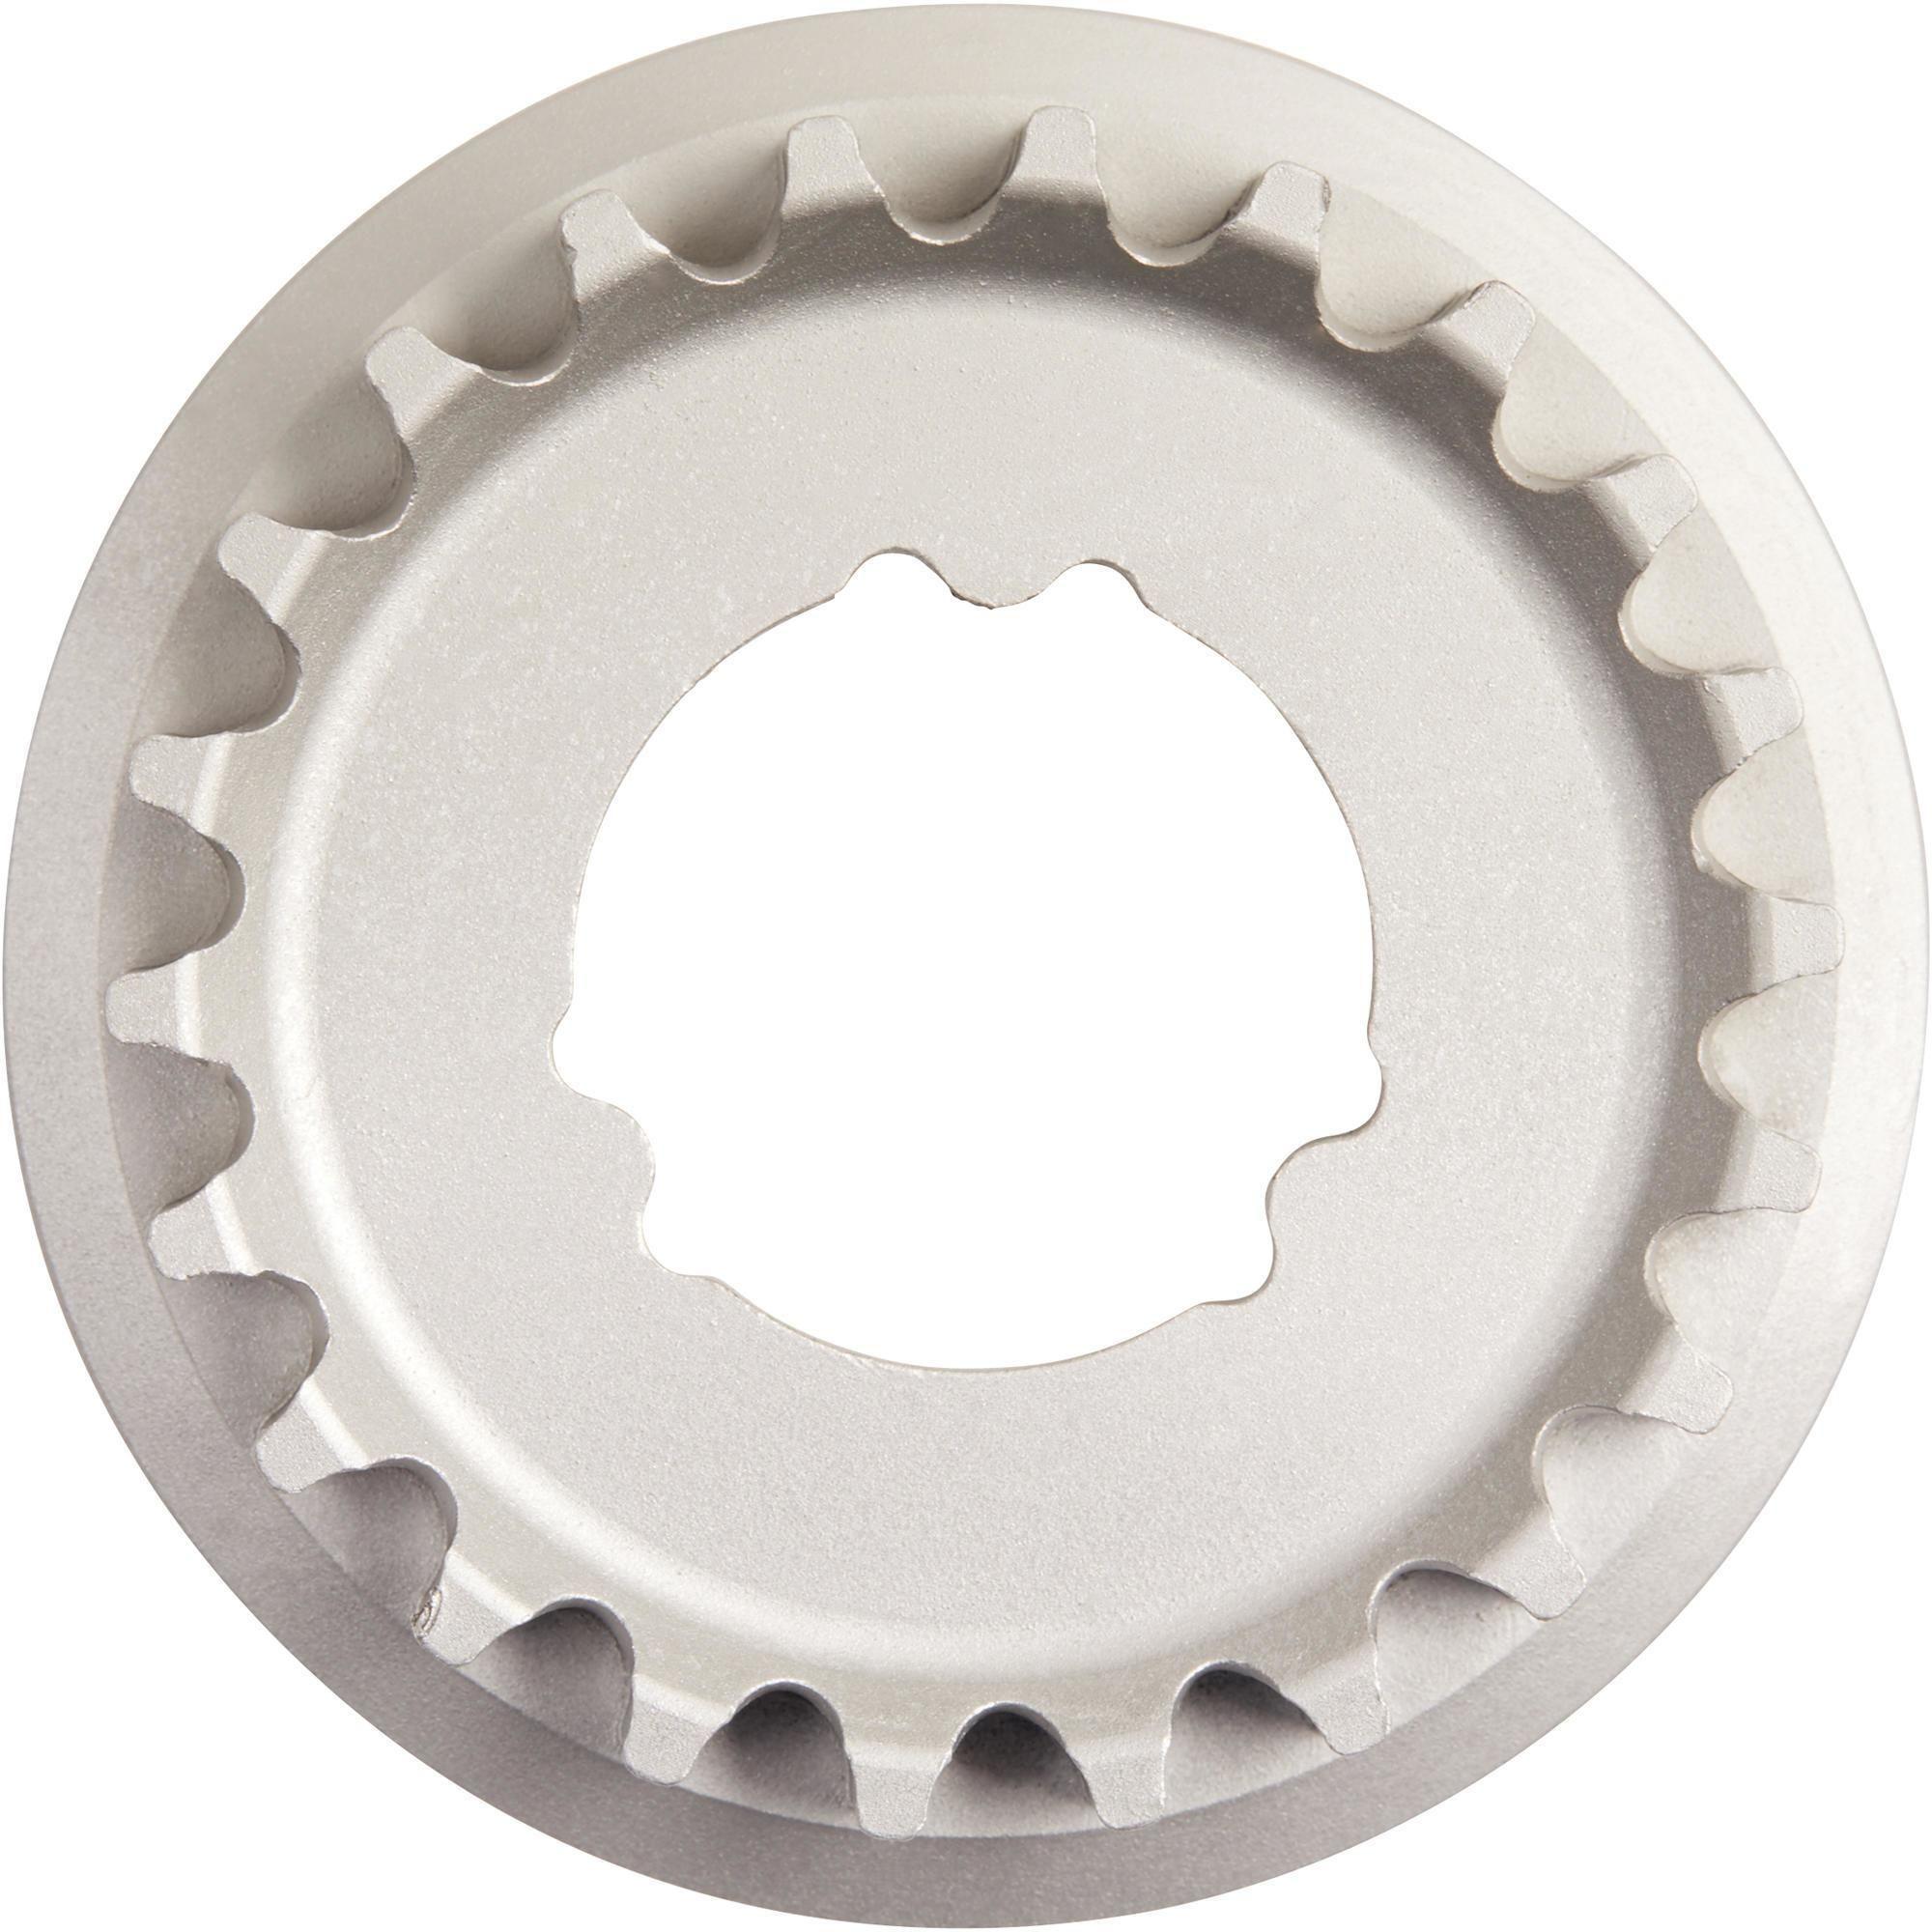 Zębatka metal 11 mm 22